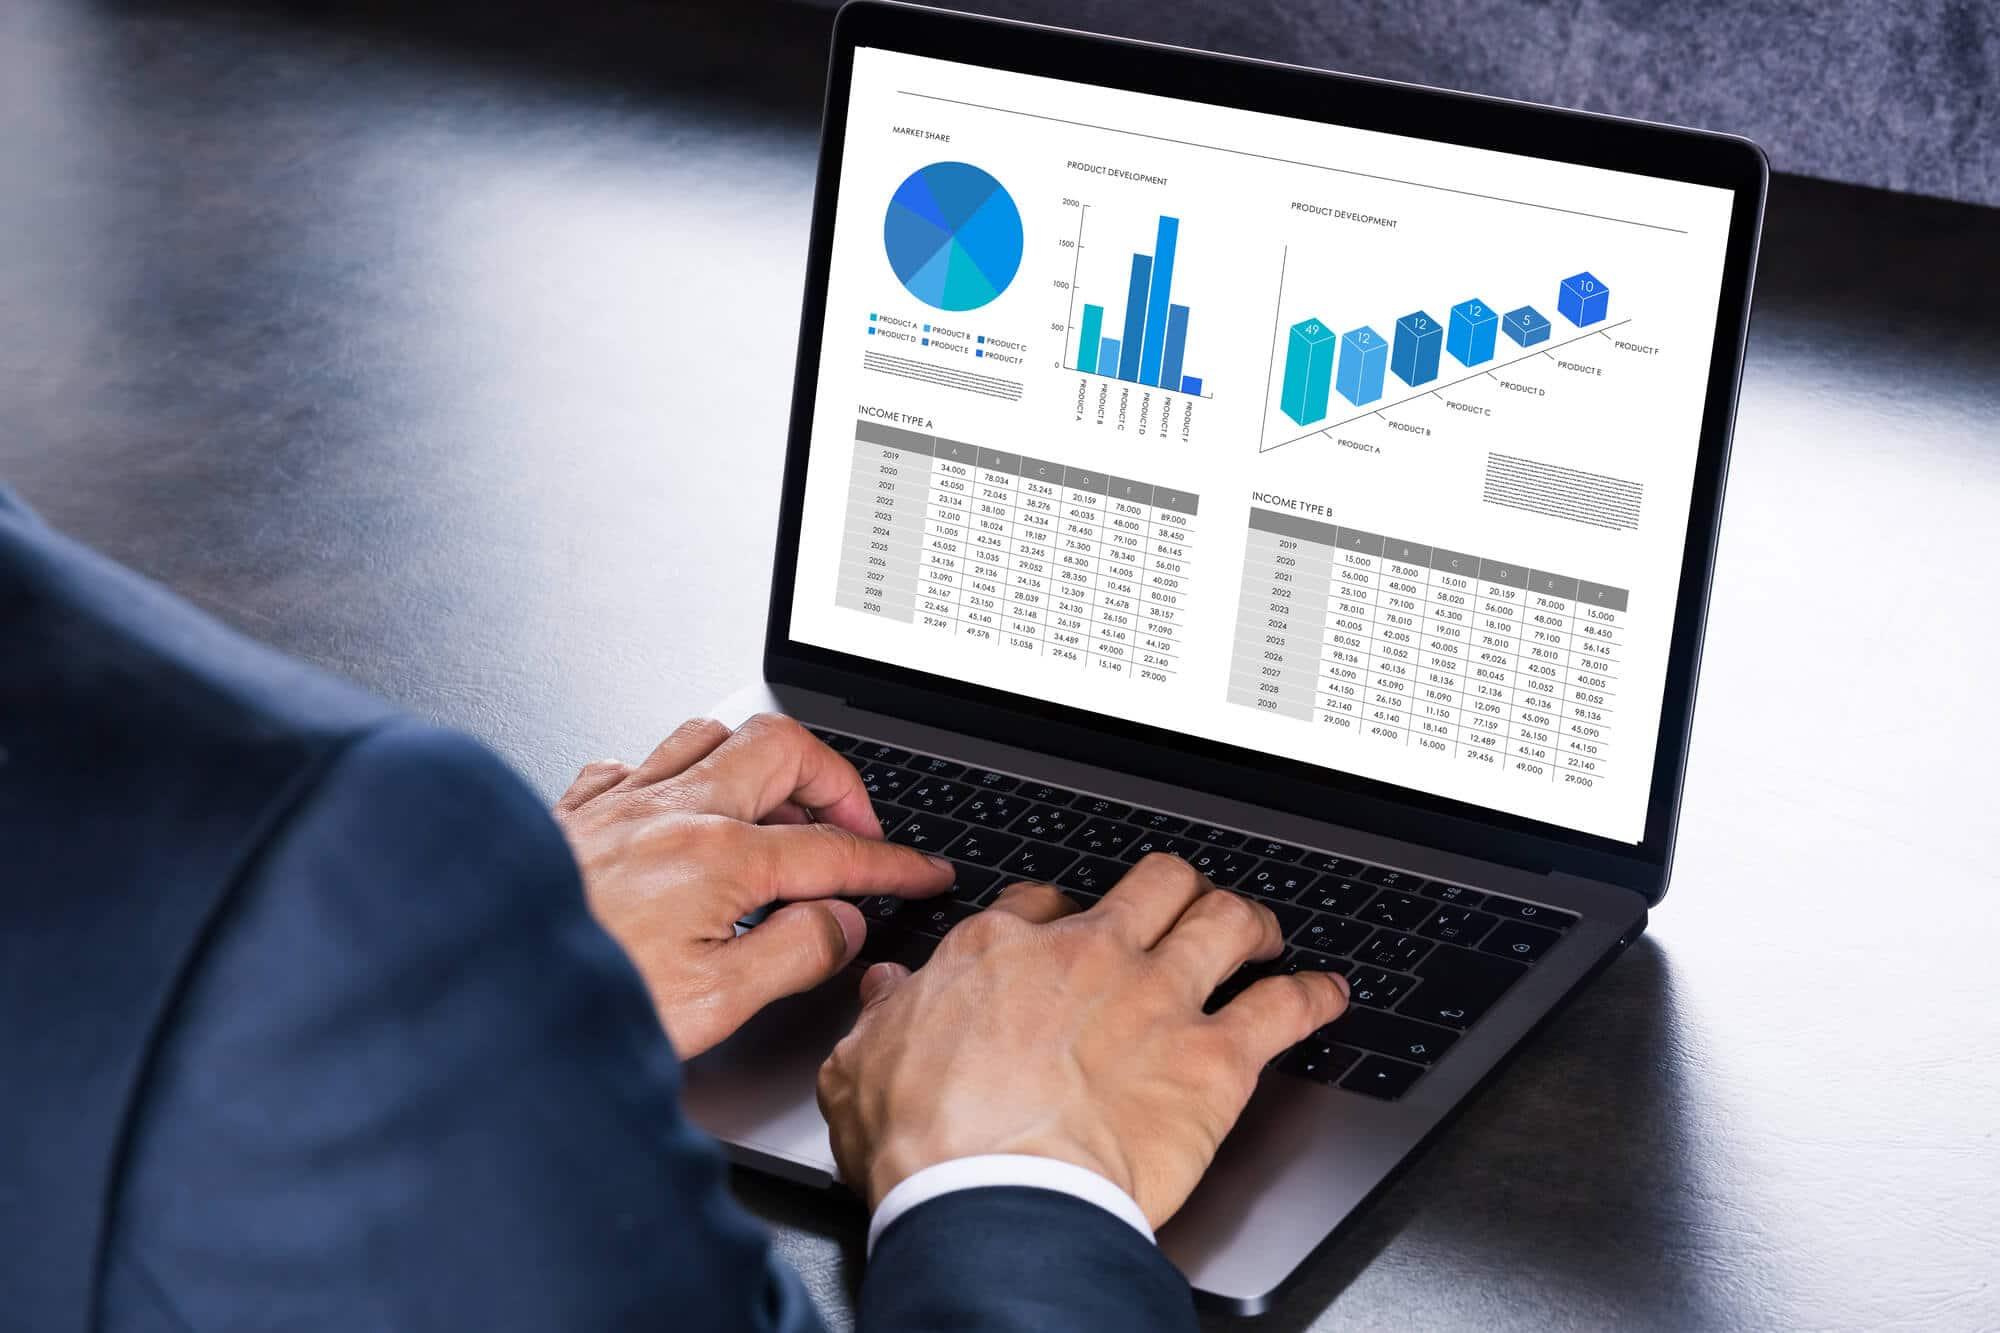 Webマーケティングの基本的な12の施策 それぞれの目的と特徴